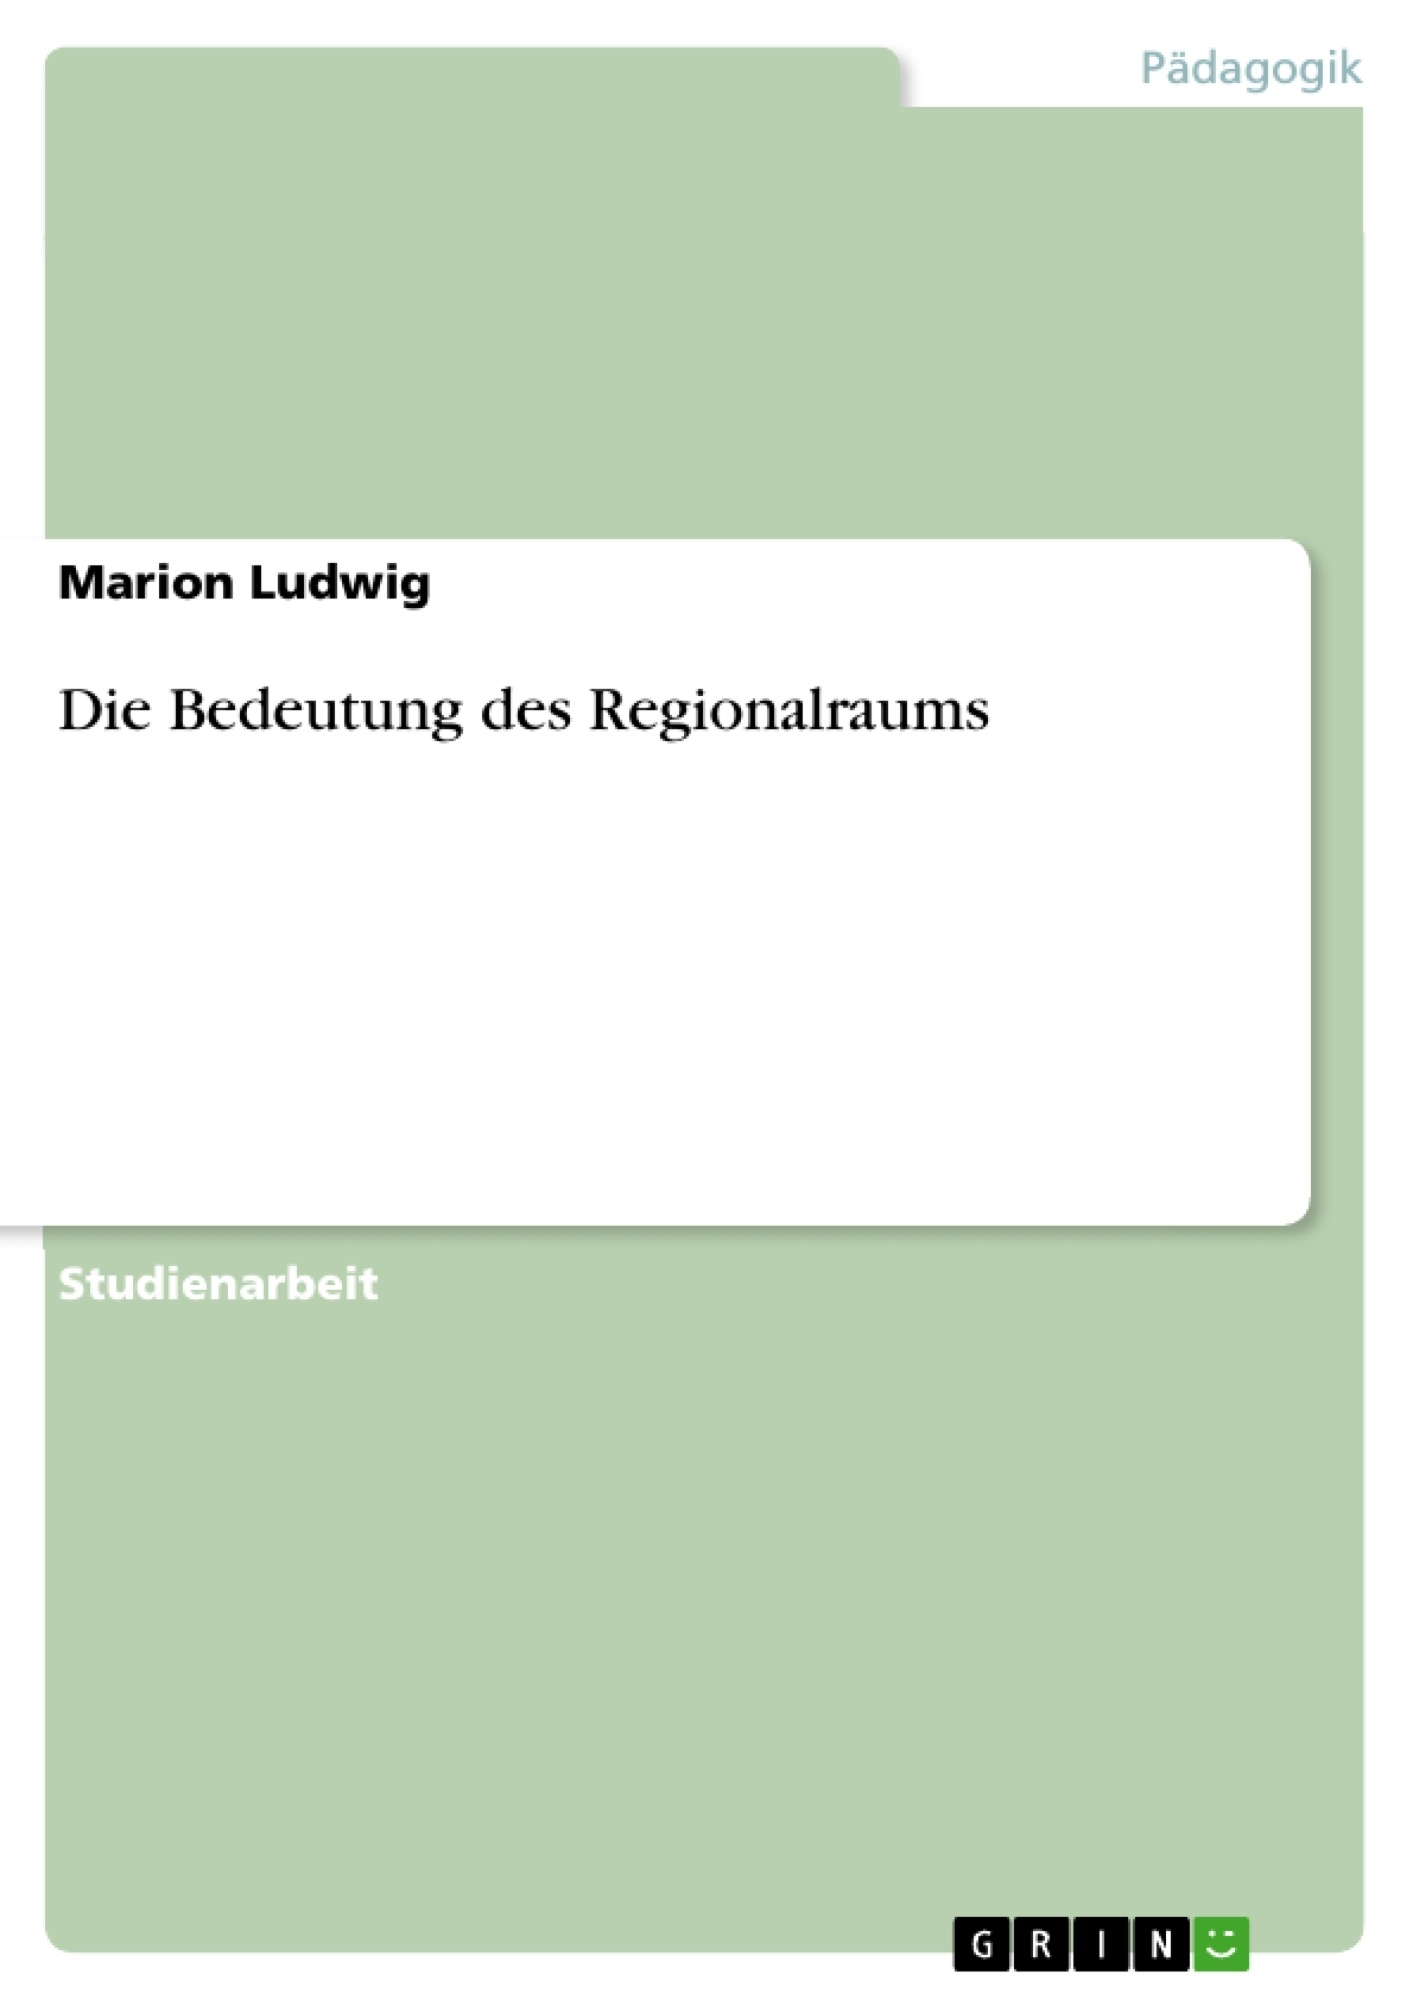 Titel: Die Bedeutung des Regionalraums